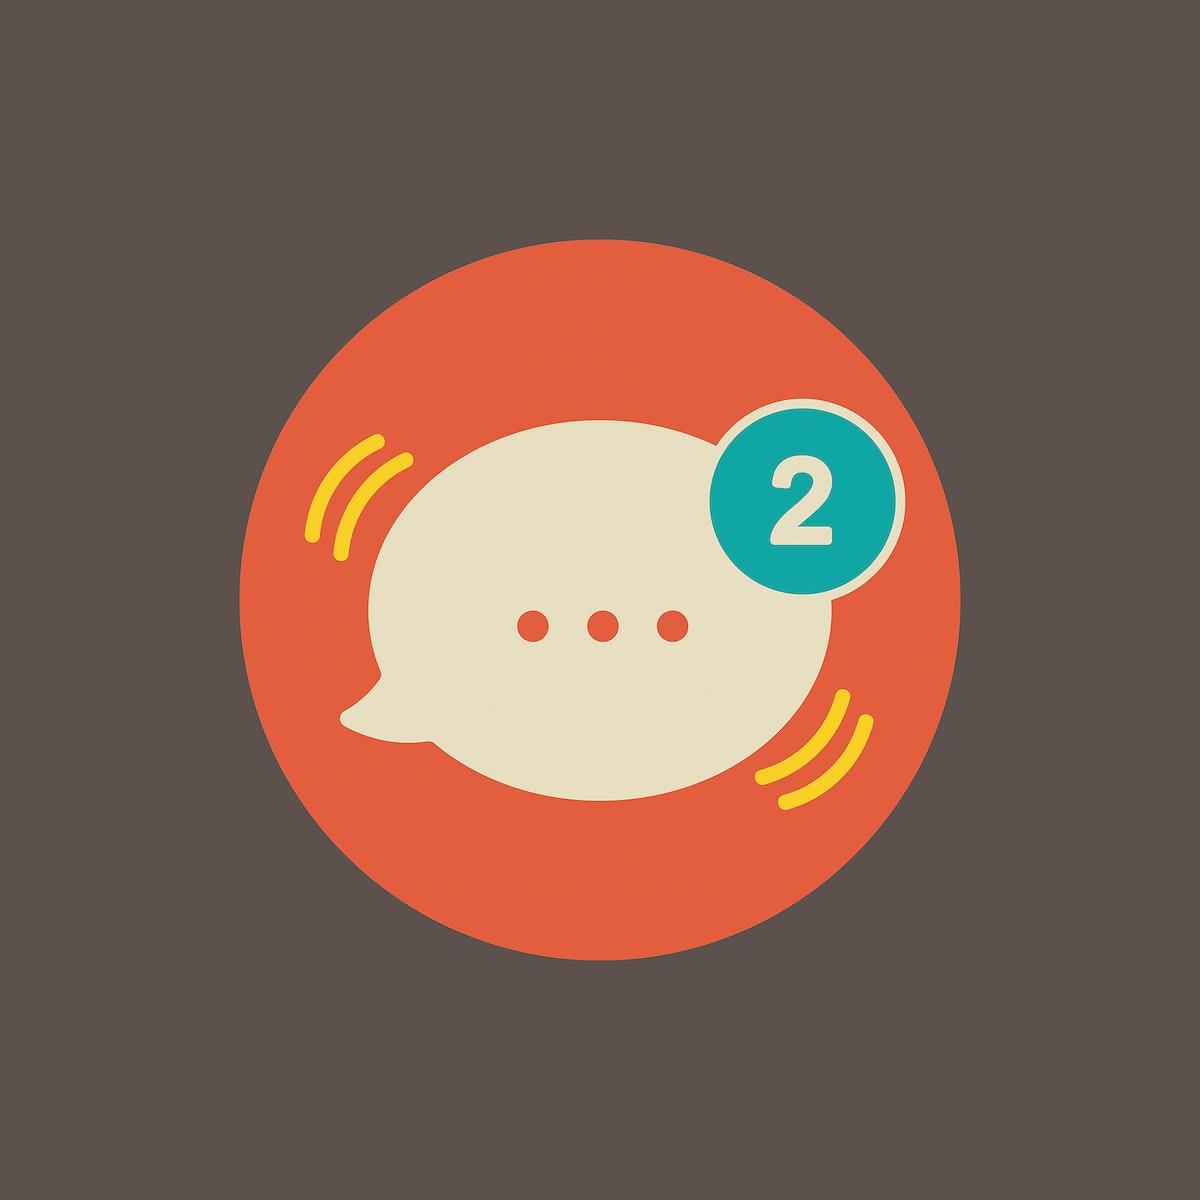 Illustration of message speech bubble icon